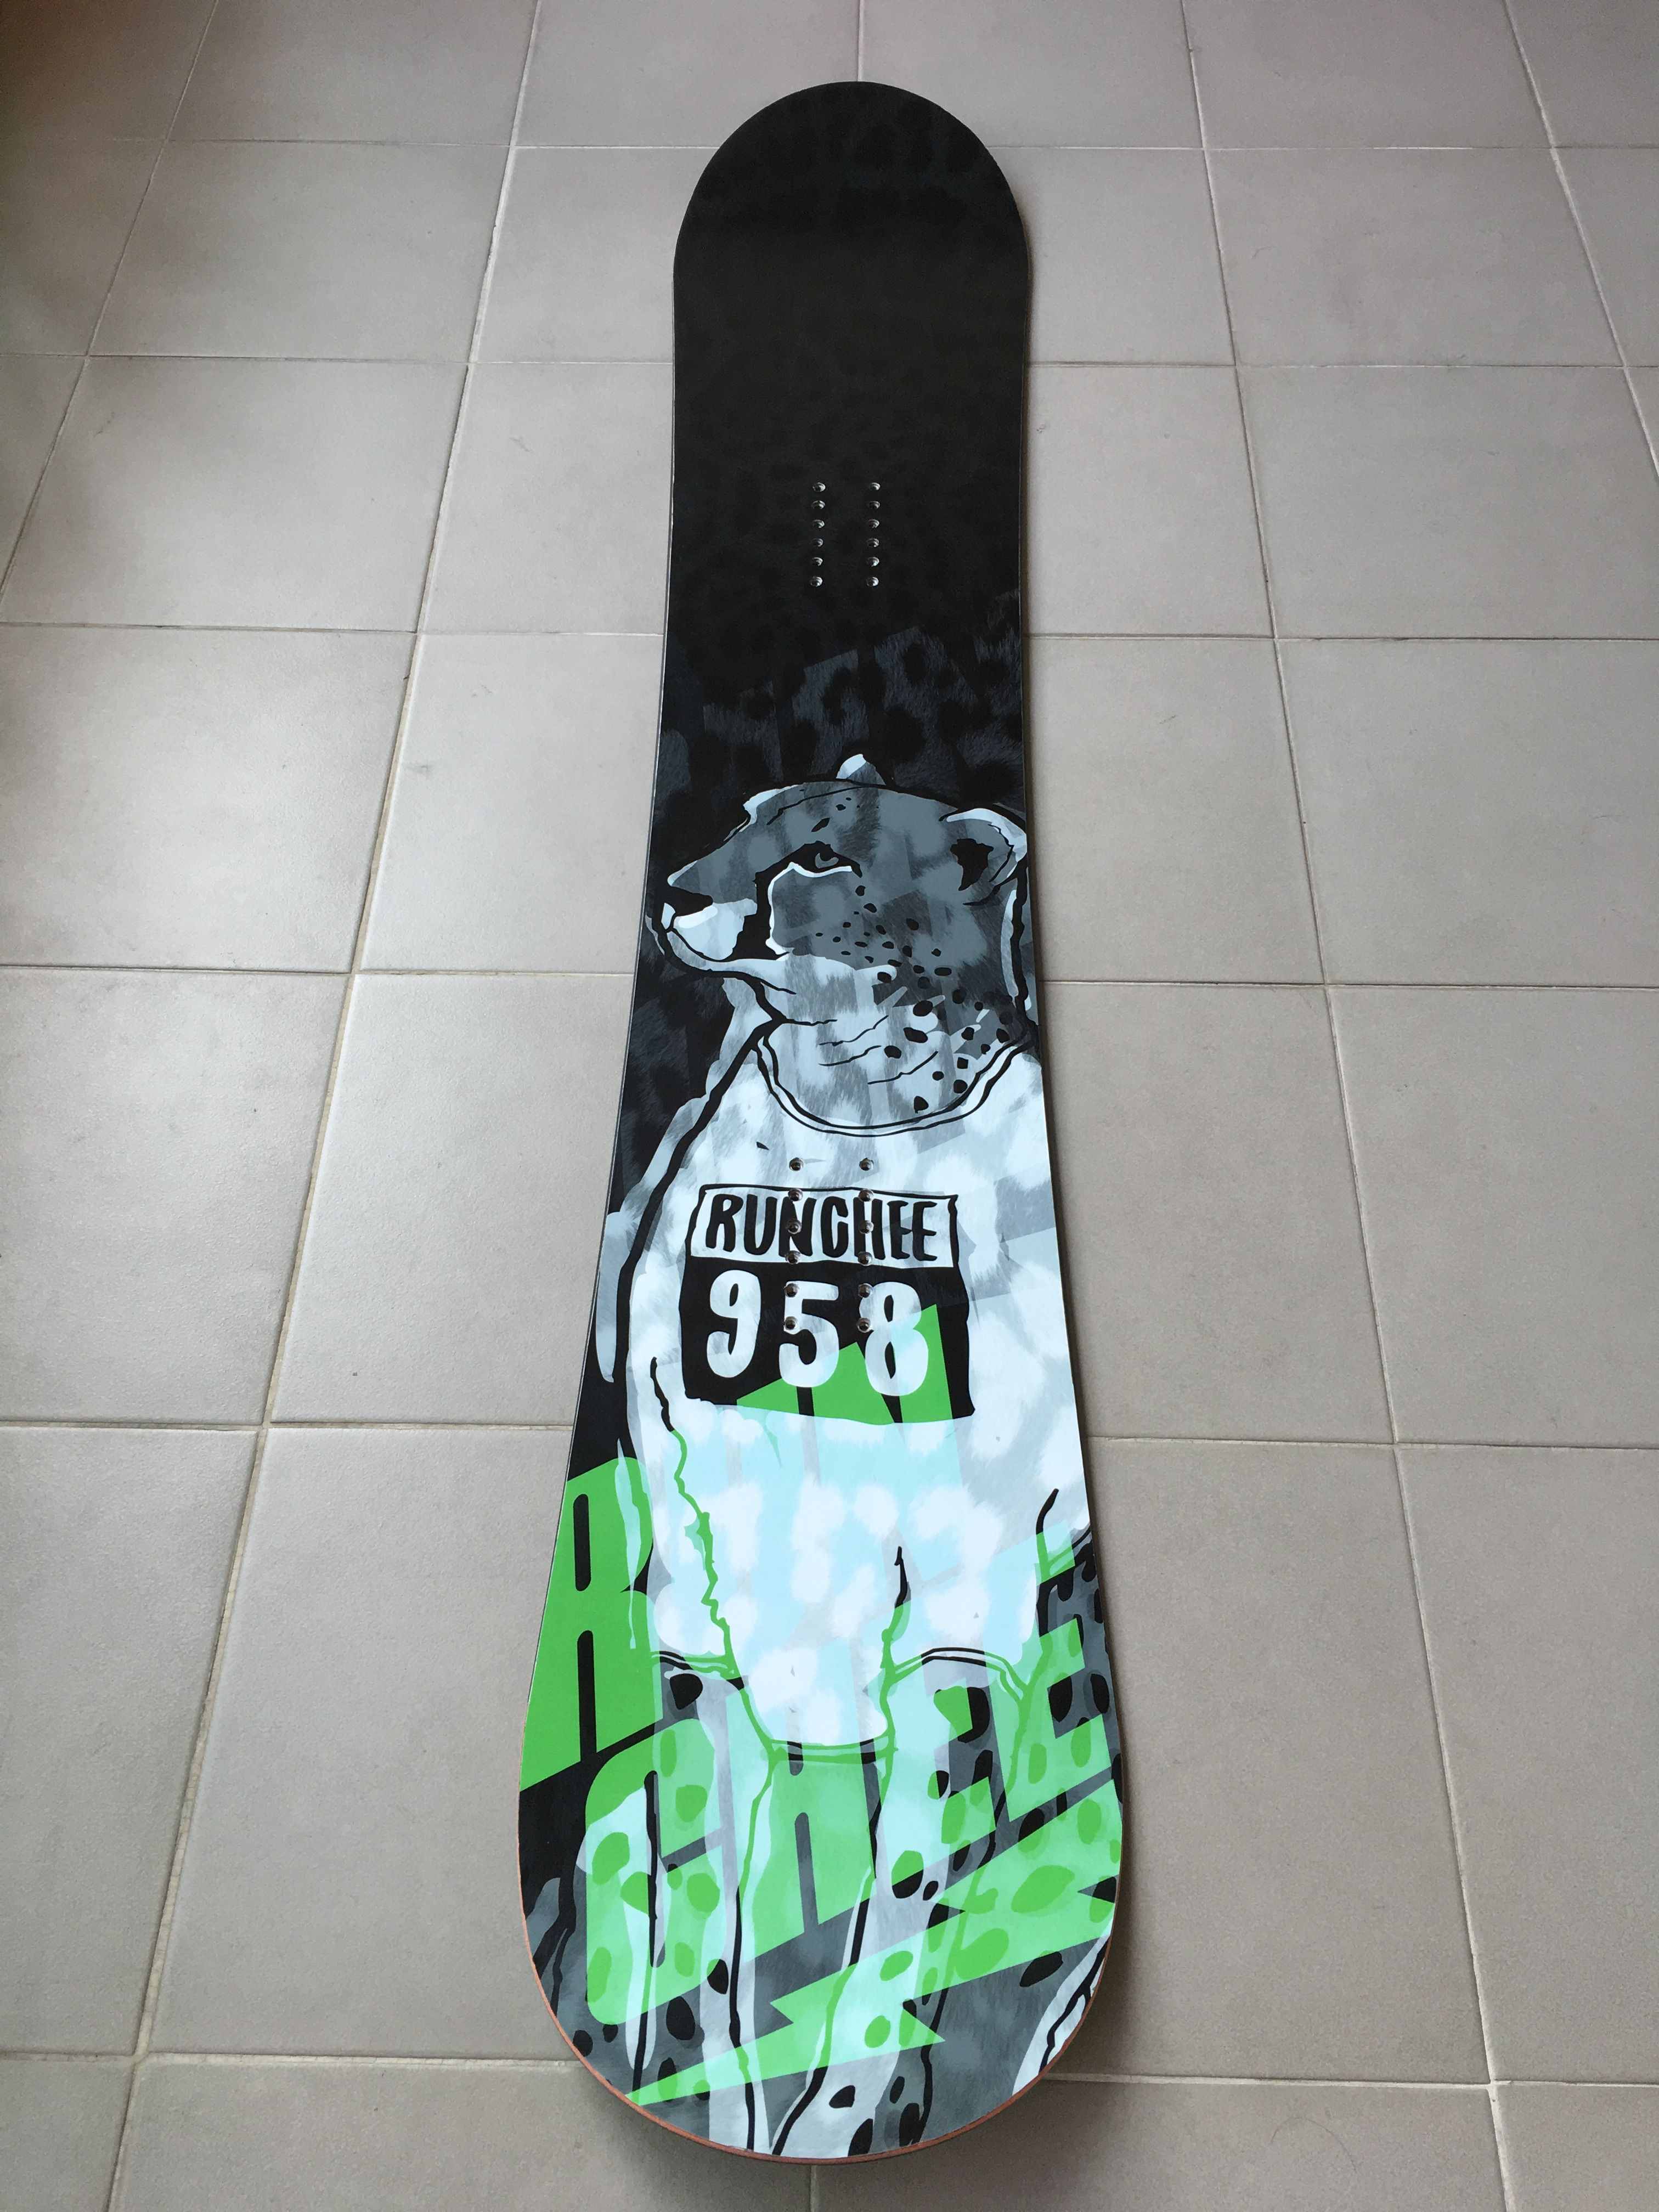 All round runing cheetha 'RUNCHEE' Extreme brand character snowboard sticker graphicer tuning design. Designed by DOLDOL. www.graphicer.com.  #Snowboard #skateboard #sk8 #longboard #surf #hiphop #bike #graphicer #mtb  #스노우보드 #롱보드 #그래피커 #치타 #스노우 #헬멧 #graffiti #character #돌돌디자인 #emblem #힙합 #stickers #인스타그램 #cheetha #runing #헬멧튜닝 #헬멧스티커 #helmet #스노우보드스티커